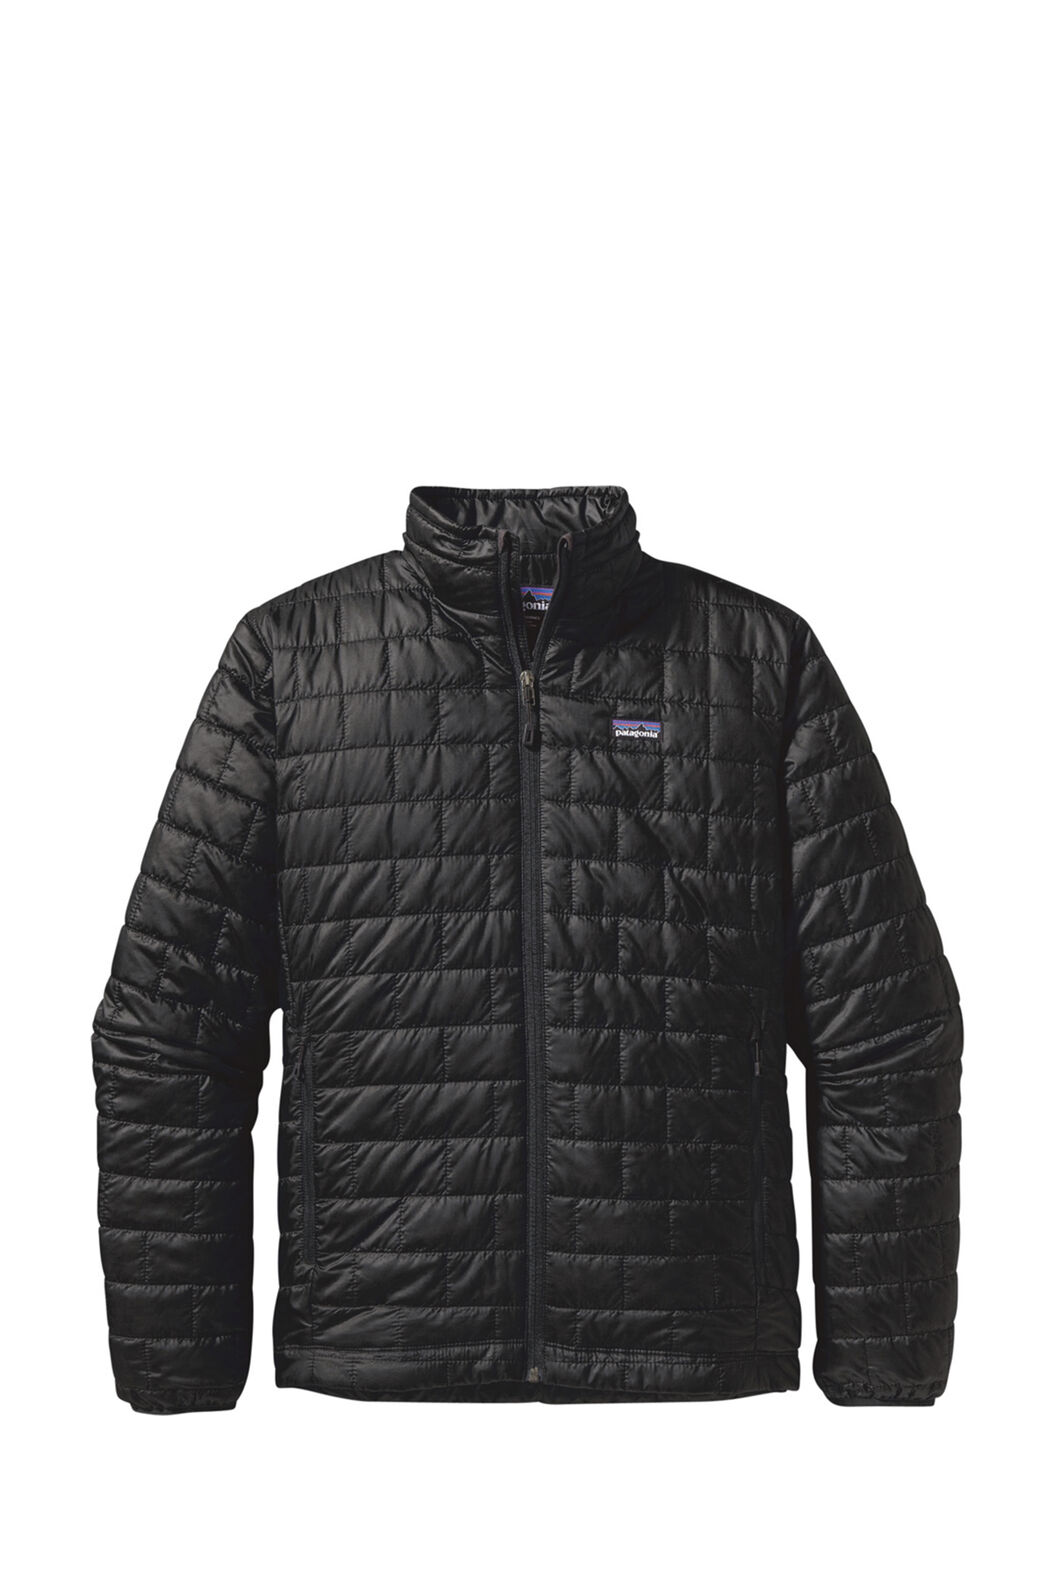 Patagonia Nano Puff Jacket — Men's, Black, hi-res